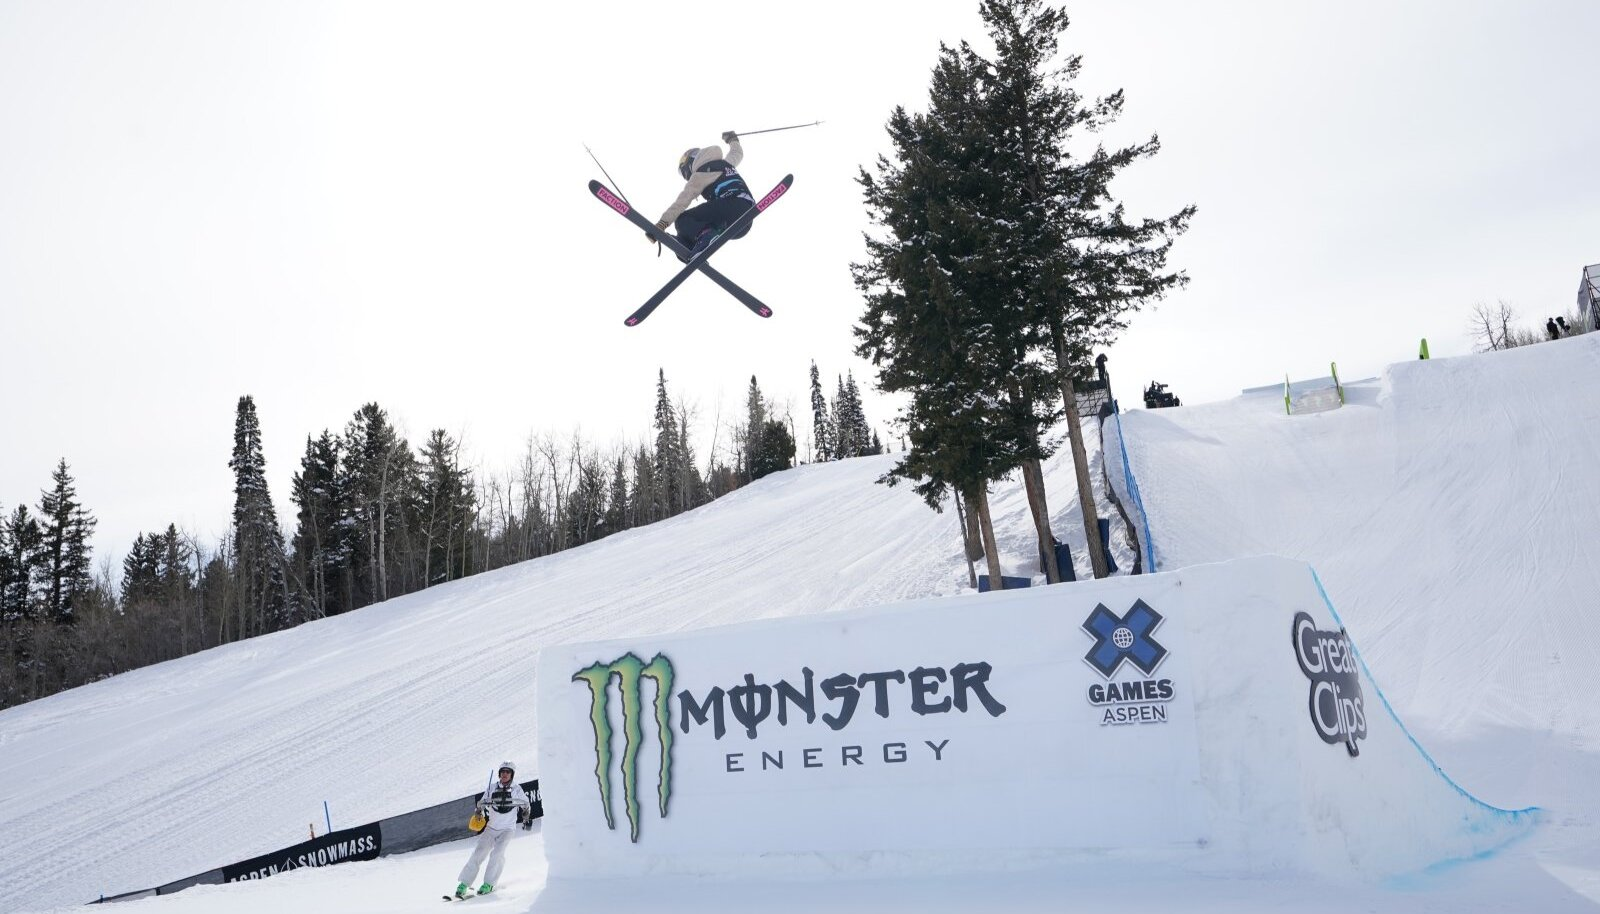 X Games Aspen 2020 - January 26, 2020